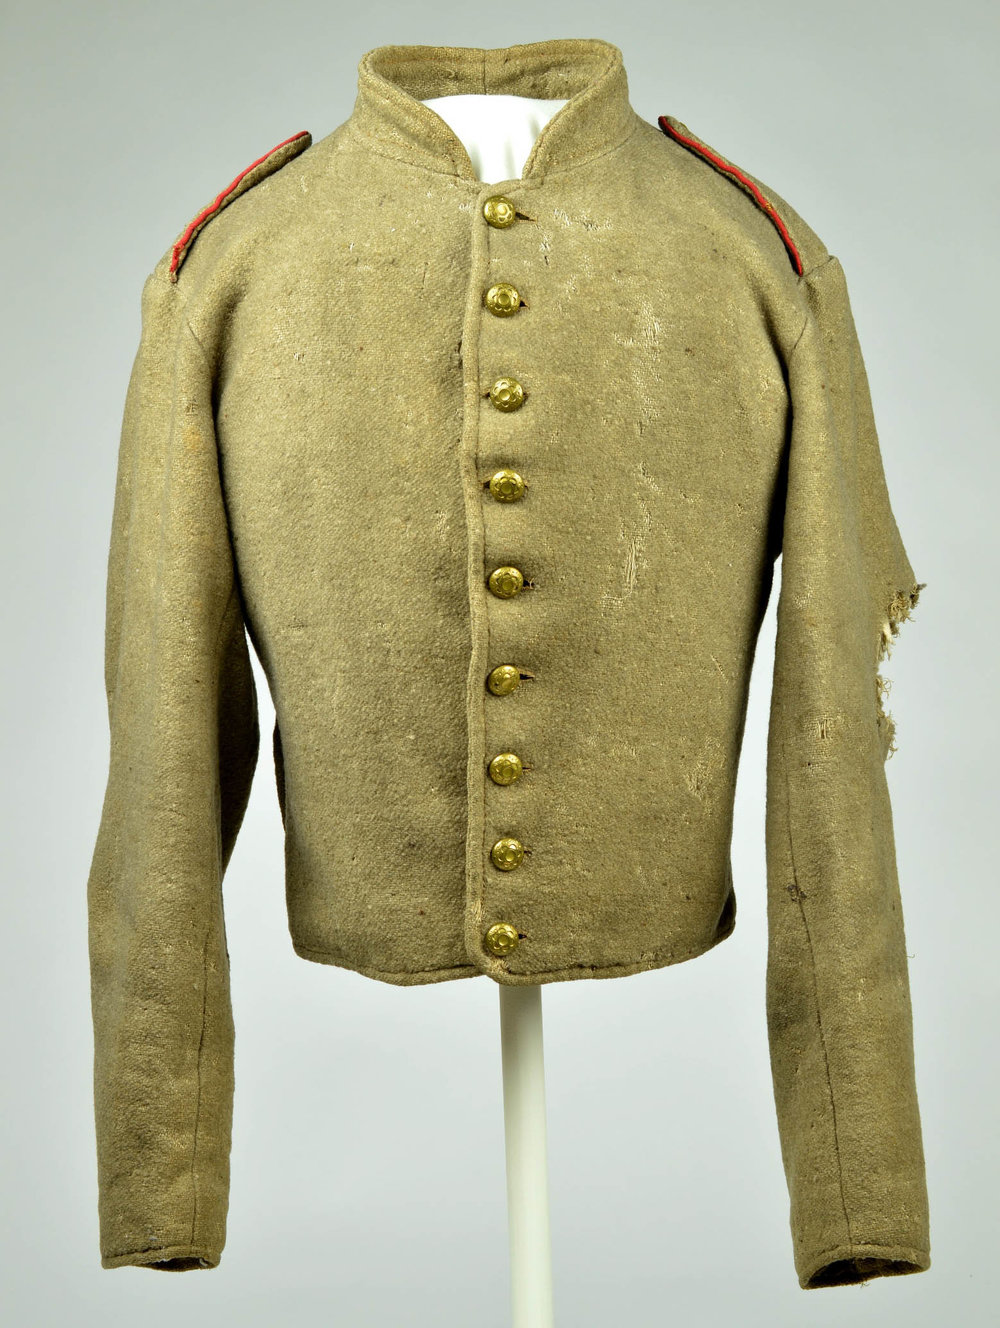 Photo courtesy of The American Civil War Museum, Richmond VA